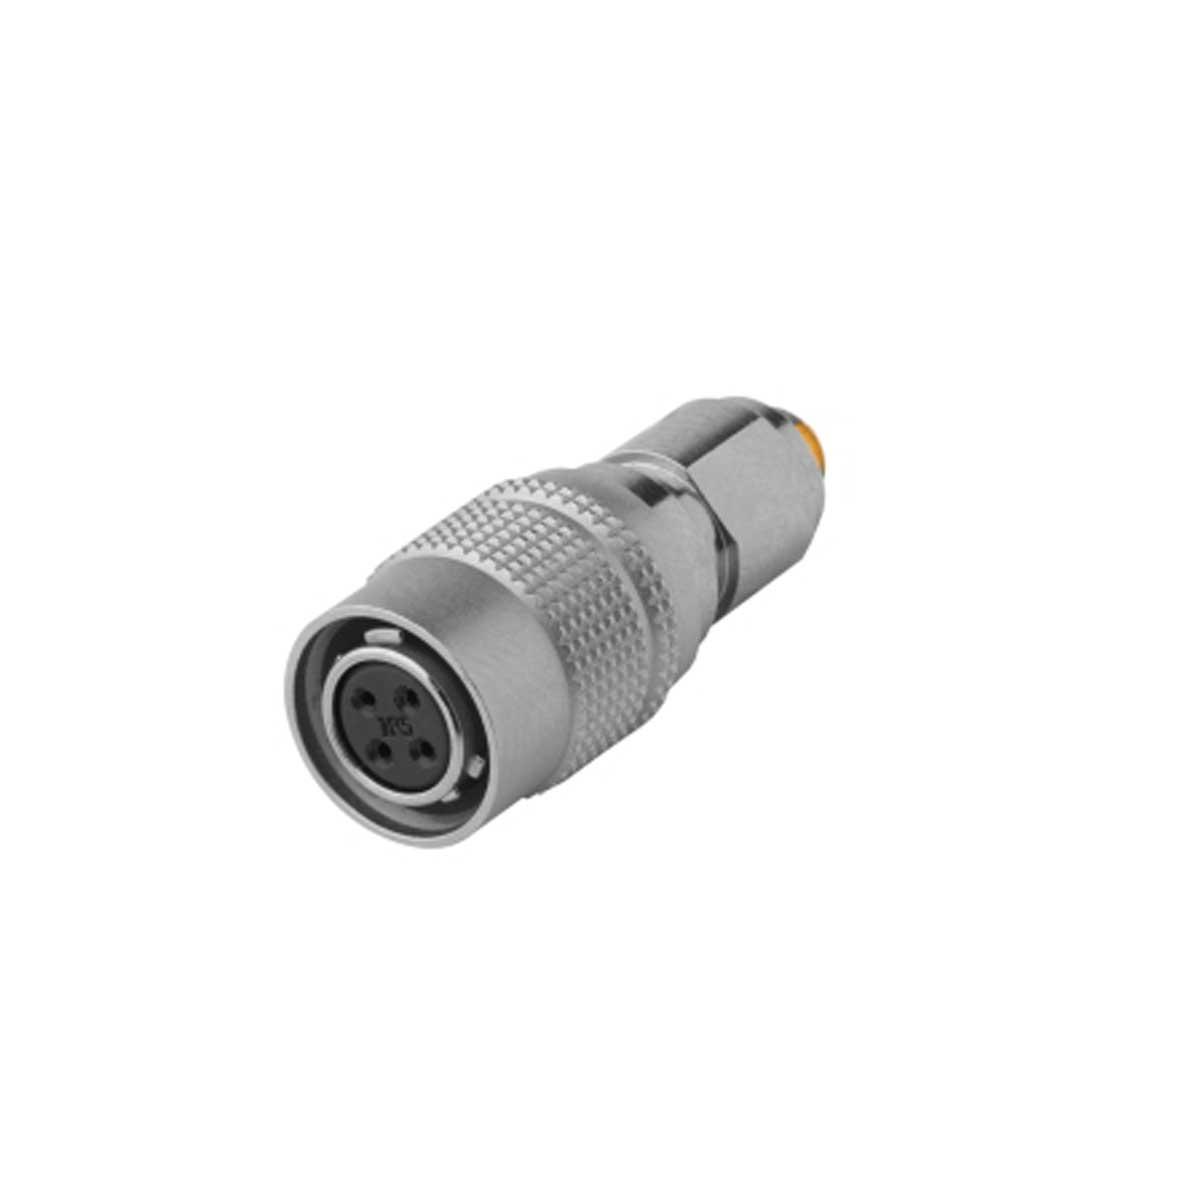 AKG エーケージー / MDA5 AT (Microdot→Hirose(4P)変換アダプター) MicroLite Series【お取り寄せ商品】